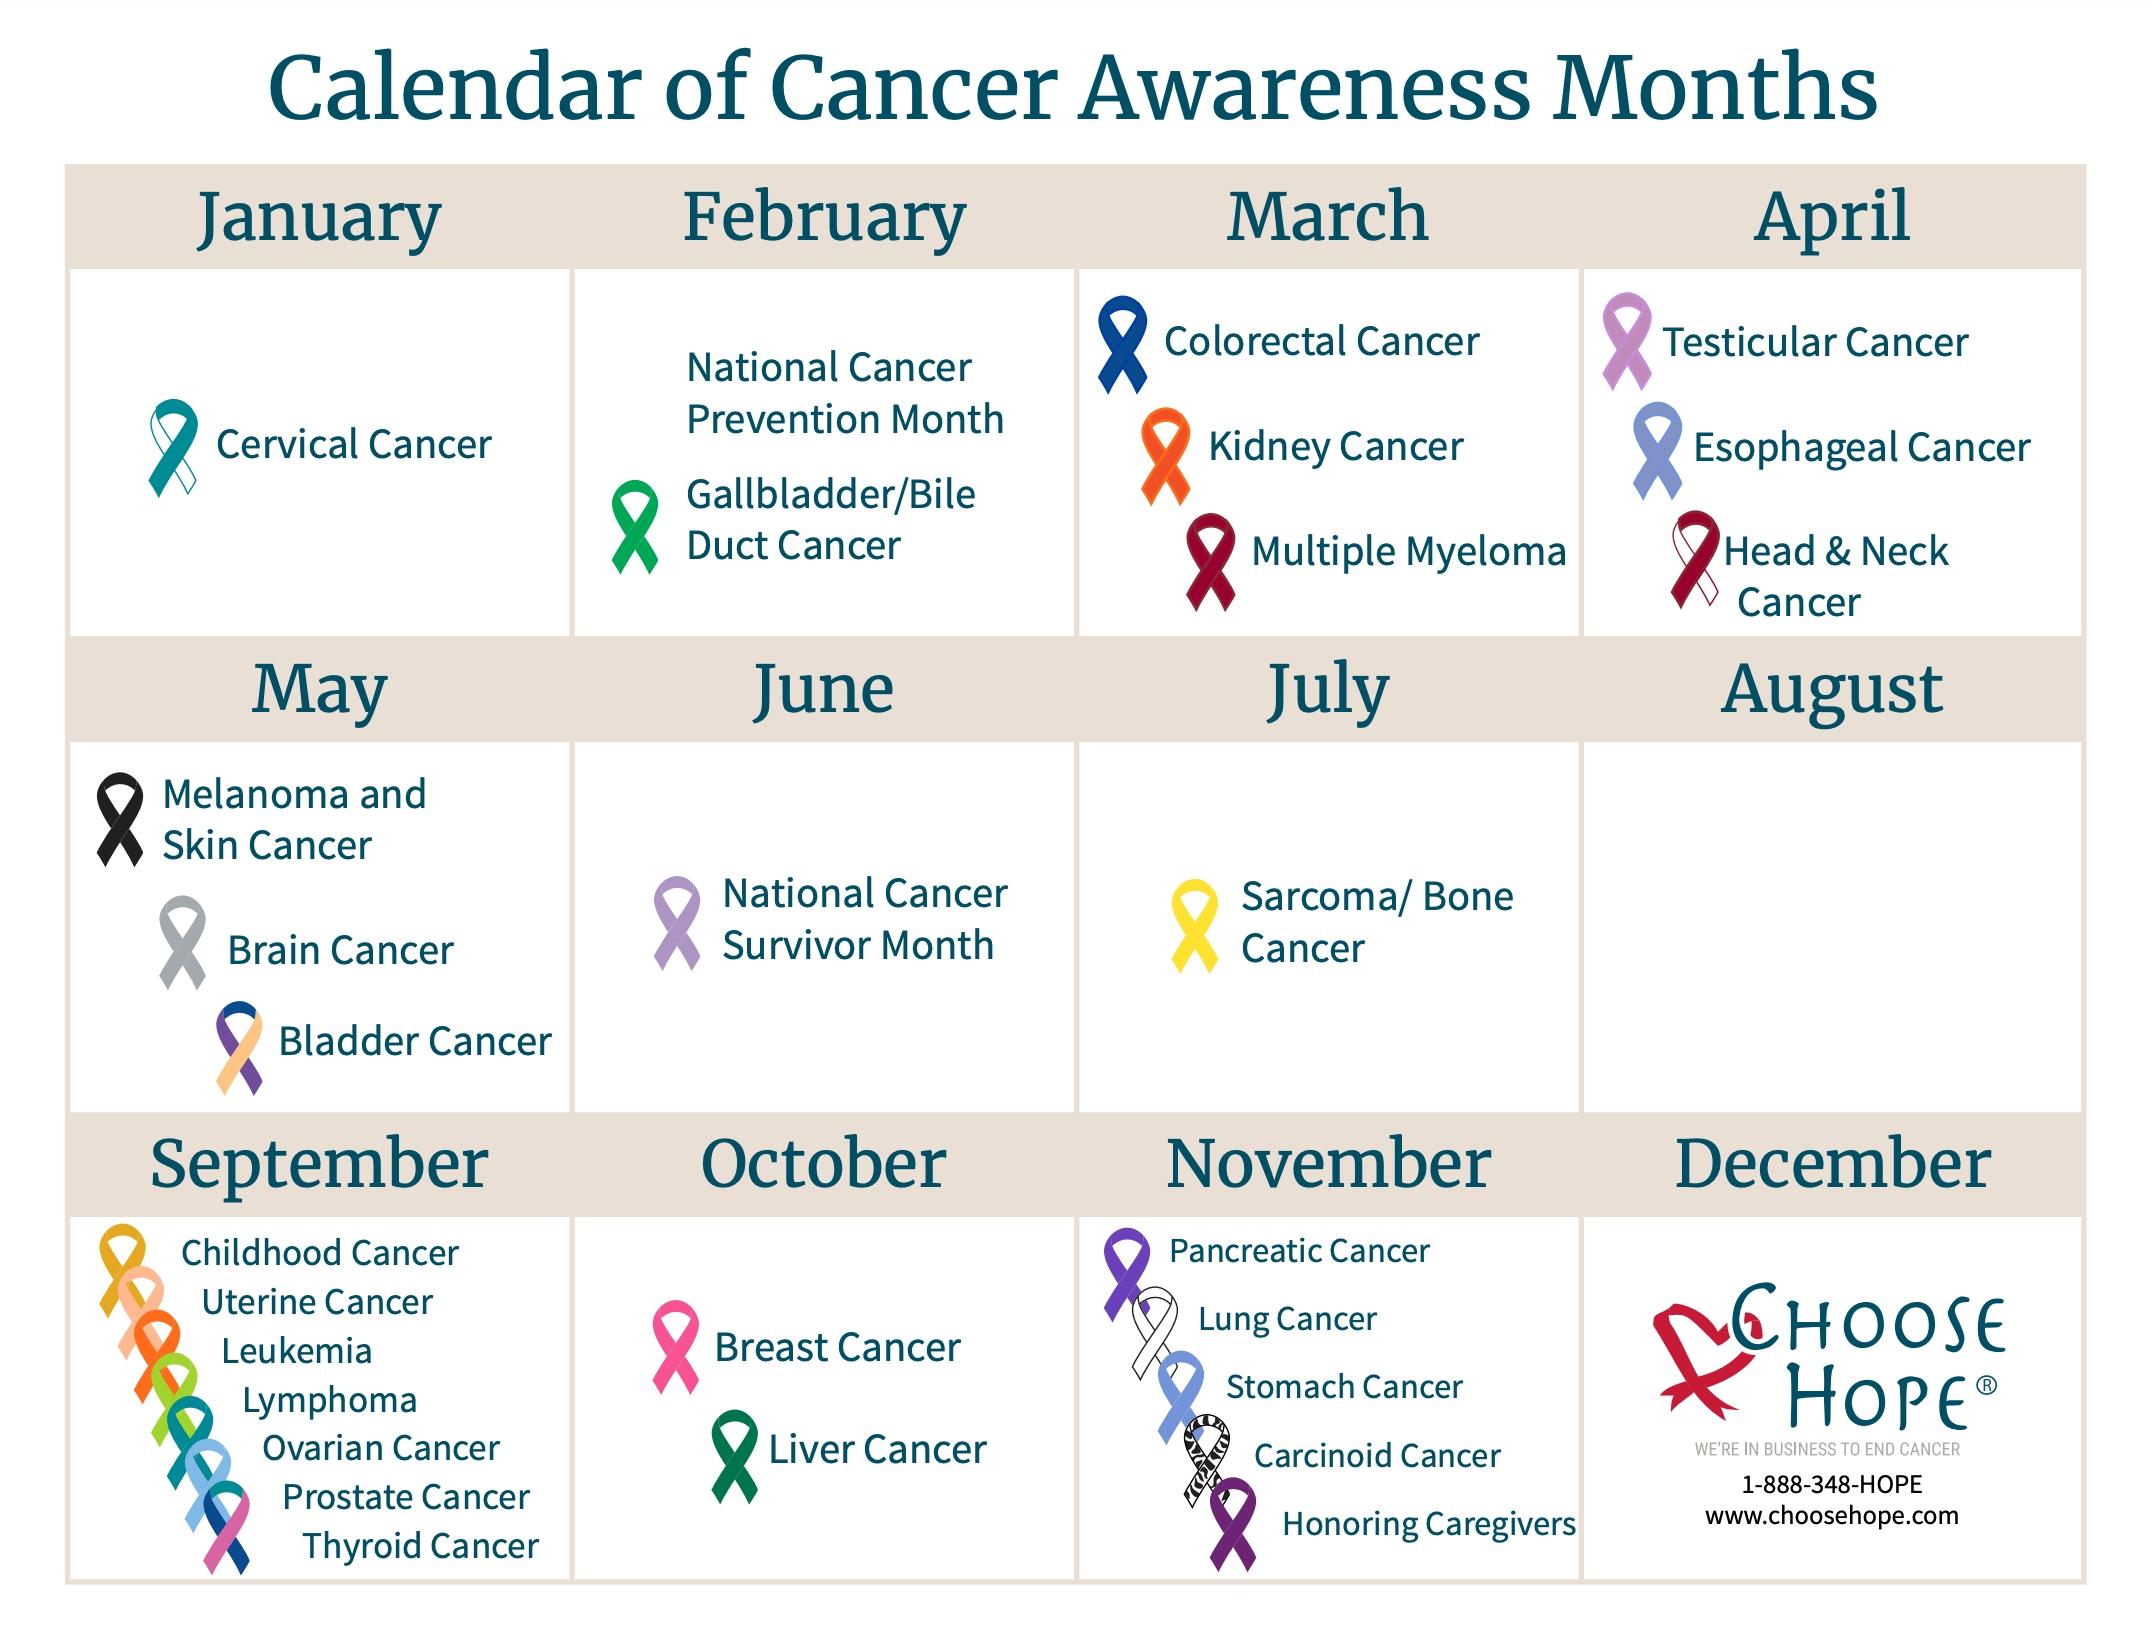 Cancer Awareness Months Calendar And Ribbon Colors | Choose Hope-August Monthly Awareness Calendar